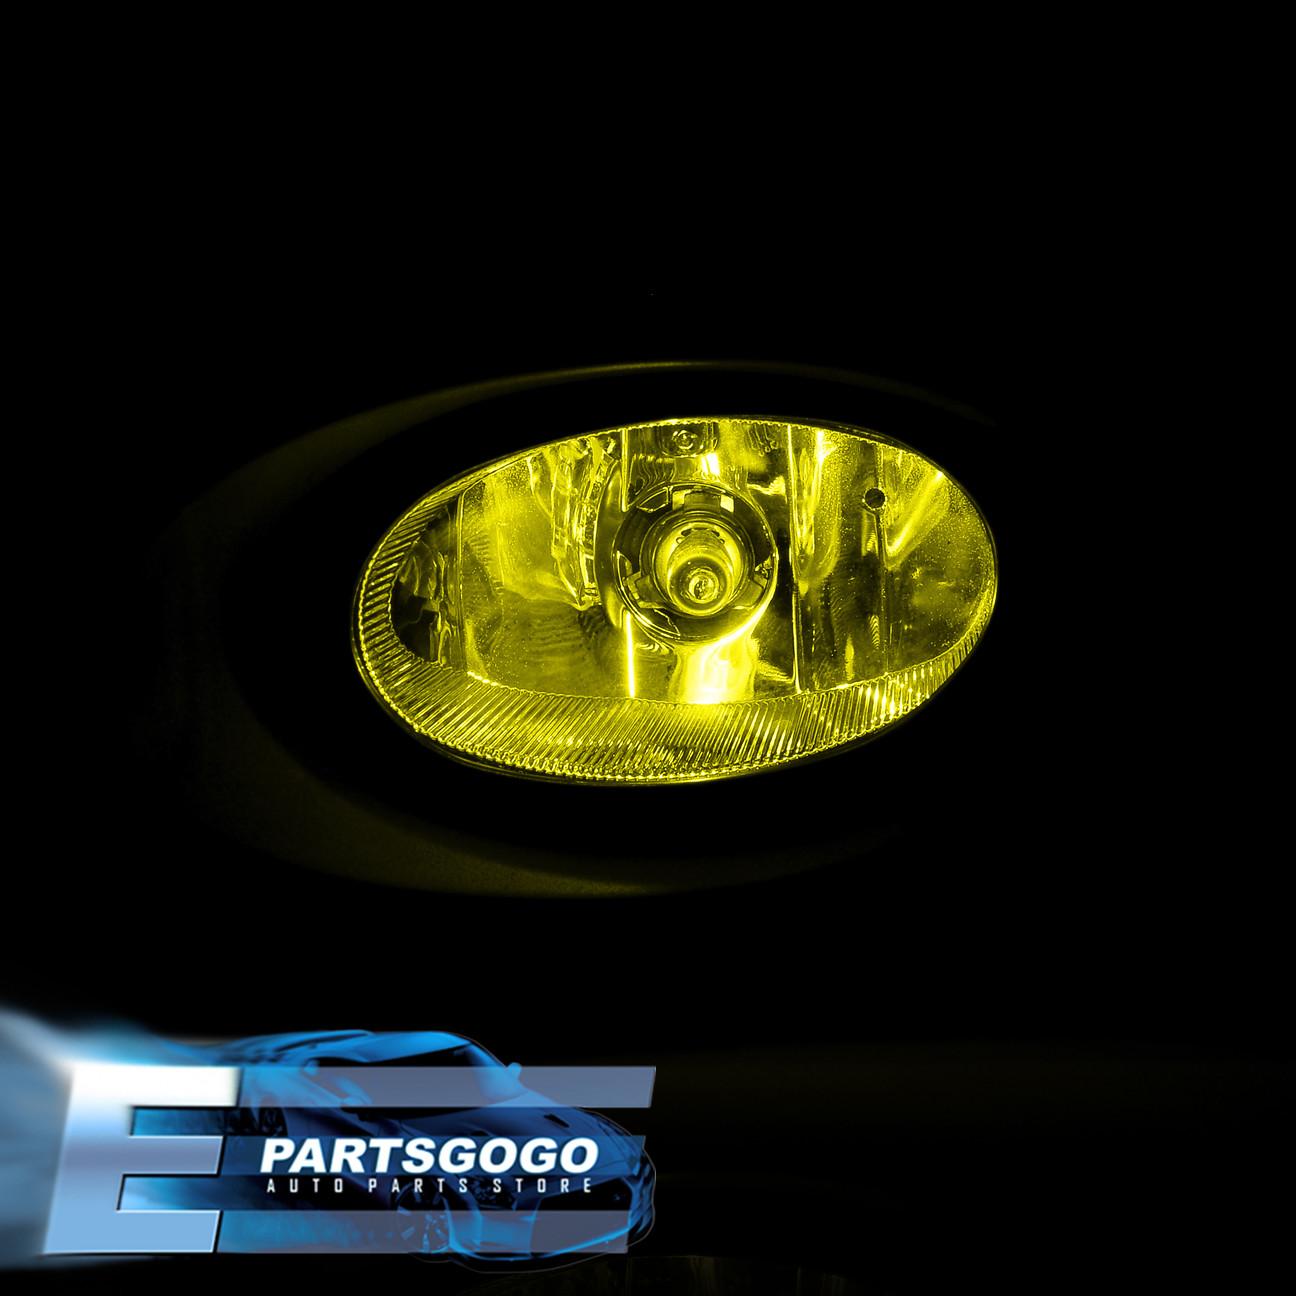 02-04 Acura Rsx Type-S Base Dc5 Jdm Yellow Lens Fog Light